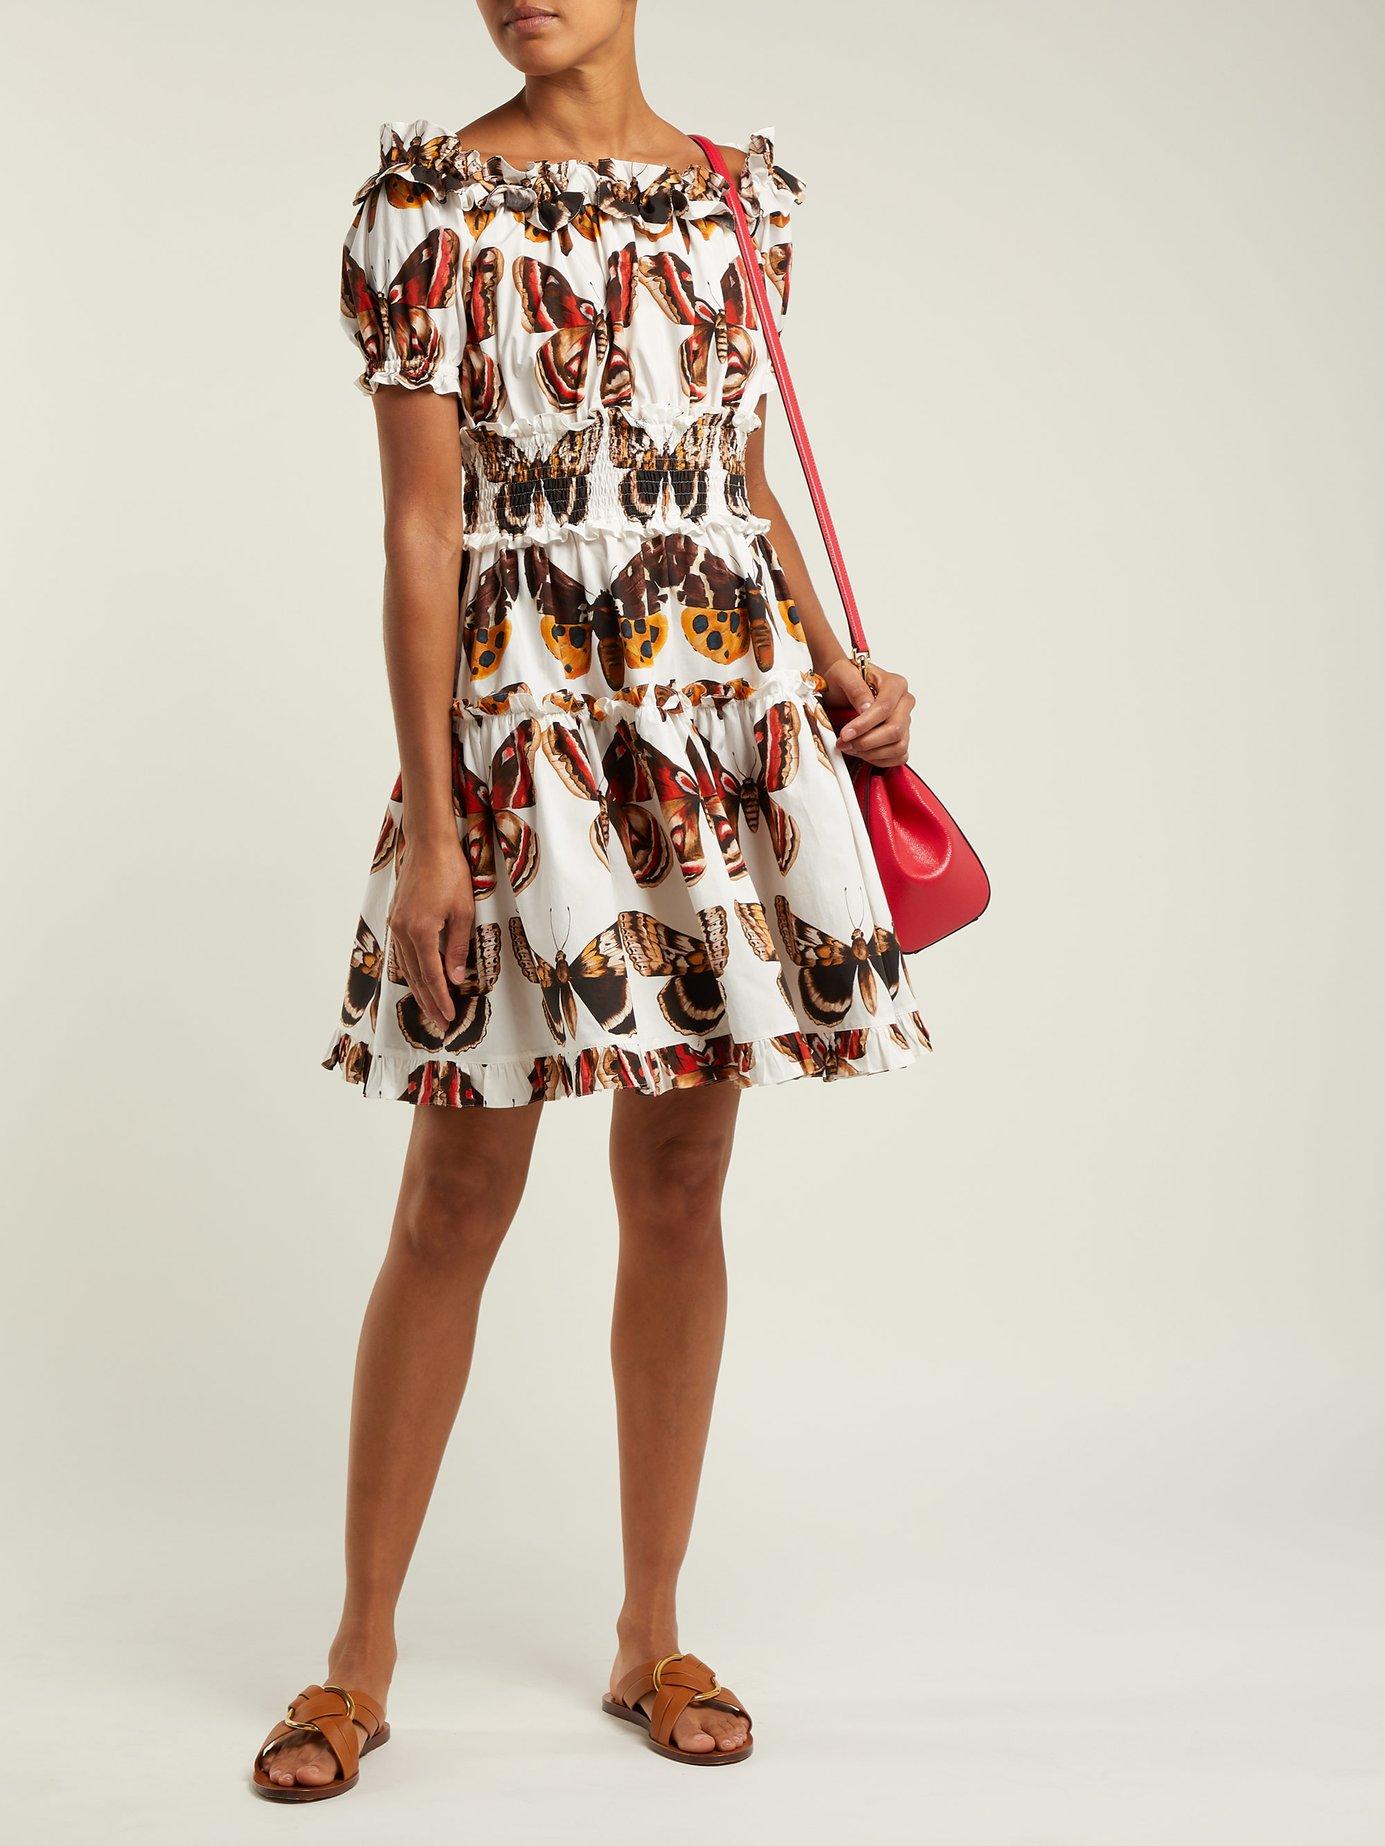 Butterfly-print cotton poplin mini dress by Dolce & Gabbana